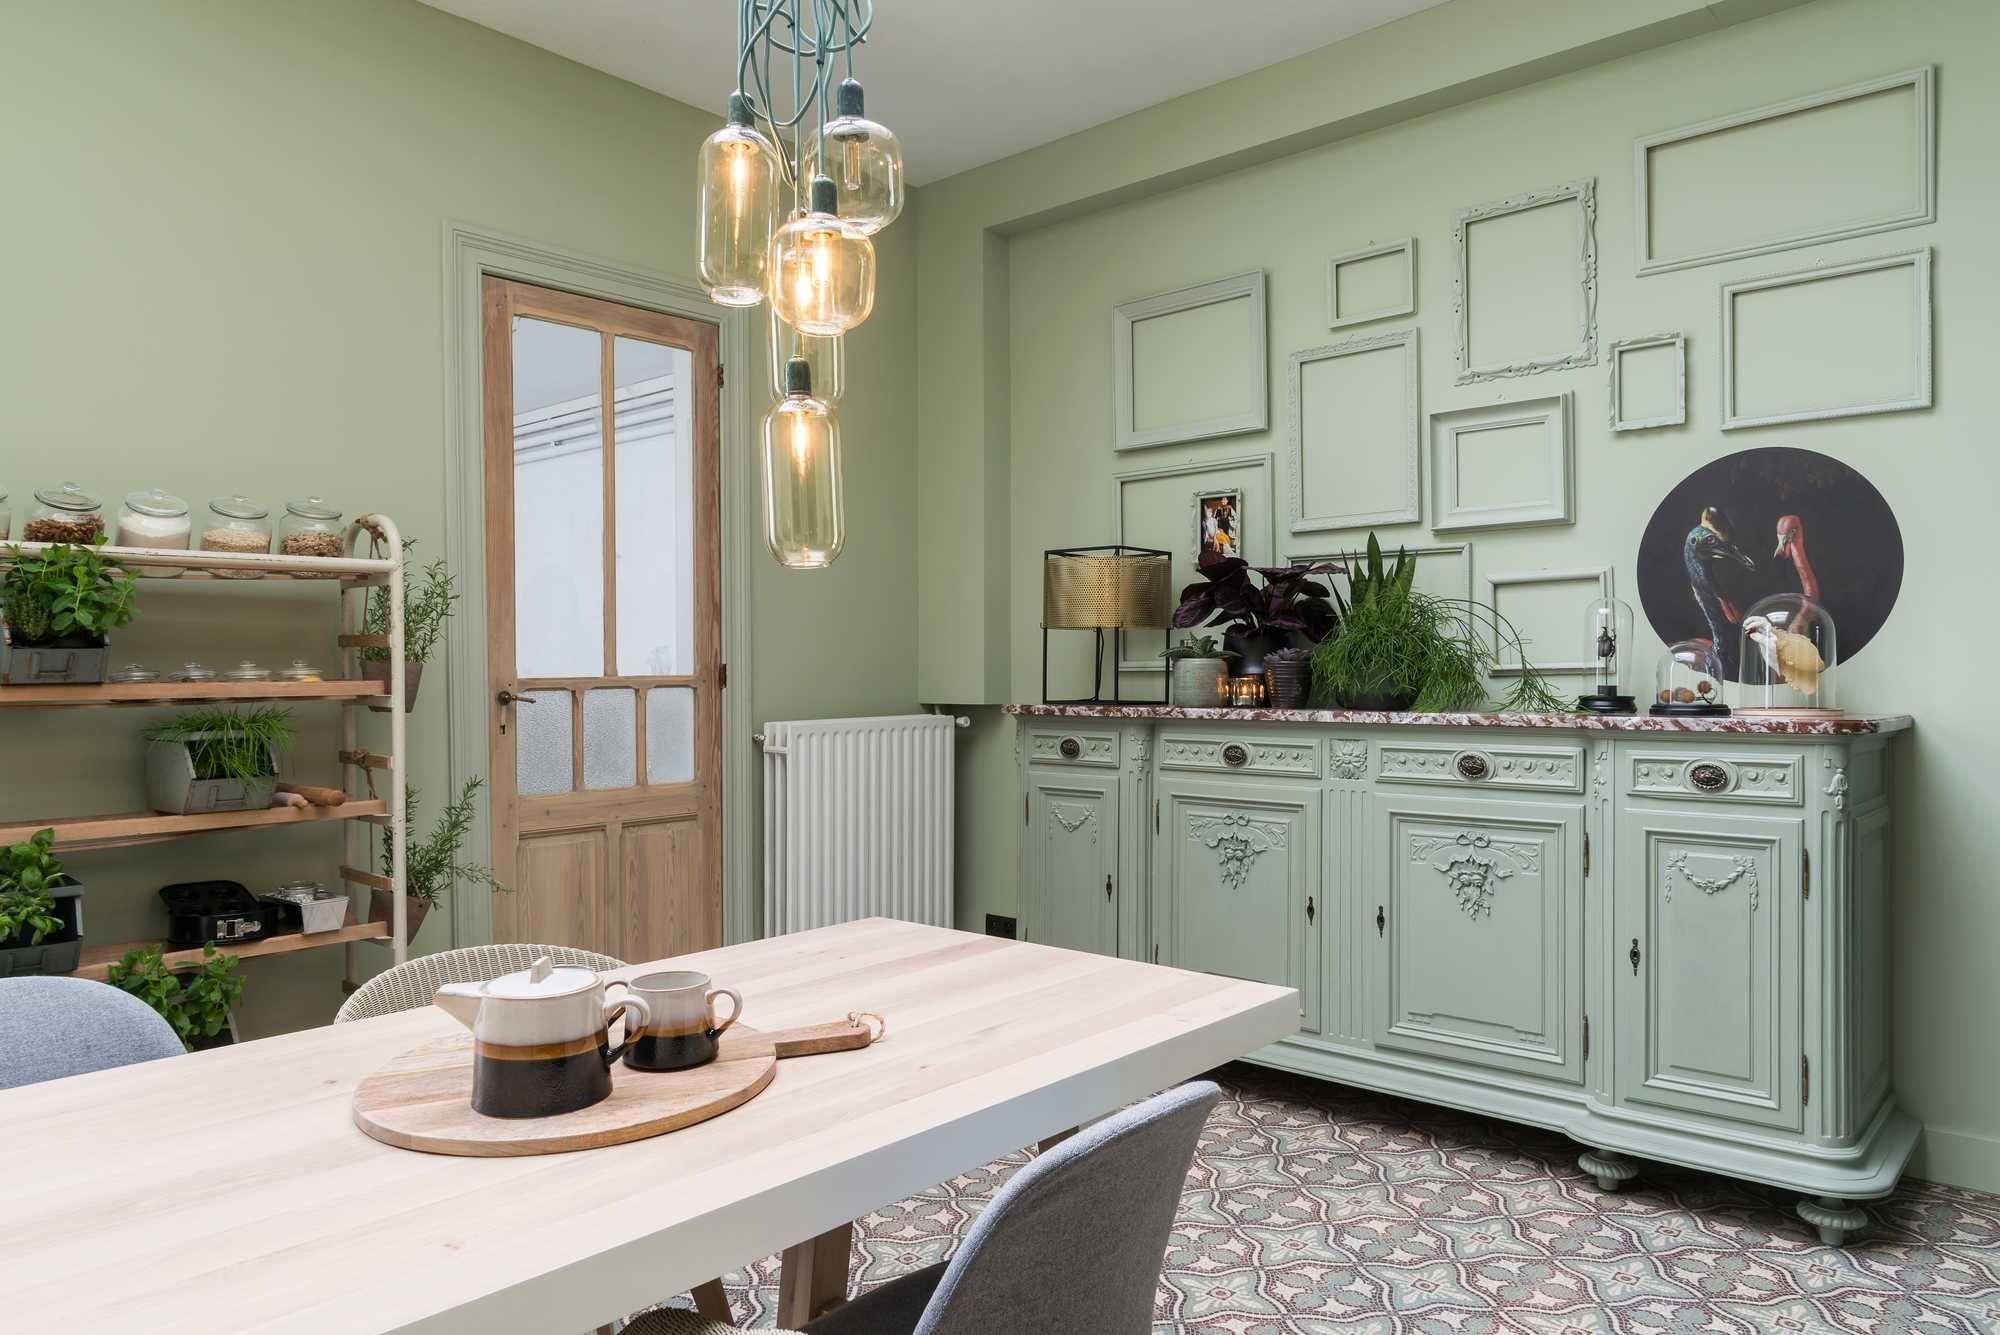 Paars Woonkamer Interieur : Heb je nog een paar kale muren in je woonkamer waar je helemaal op